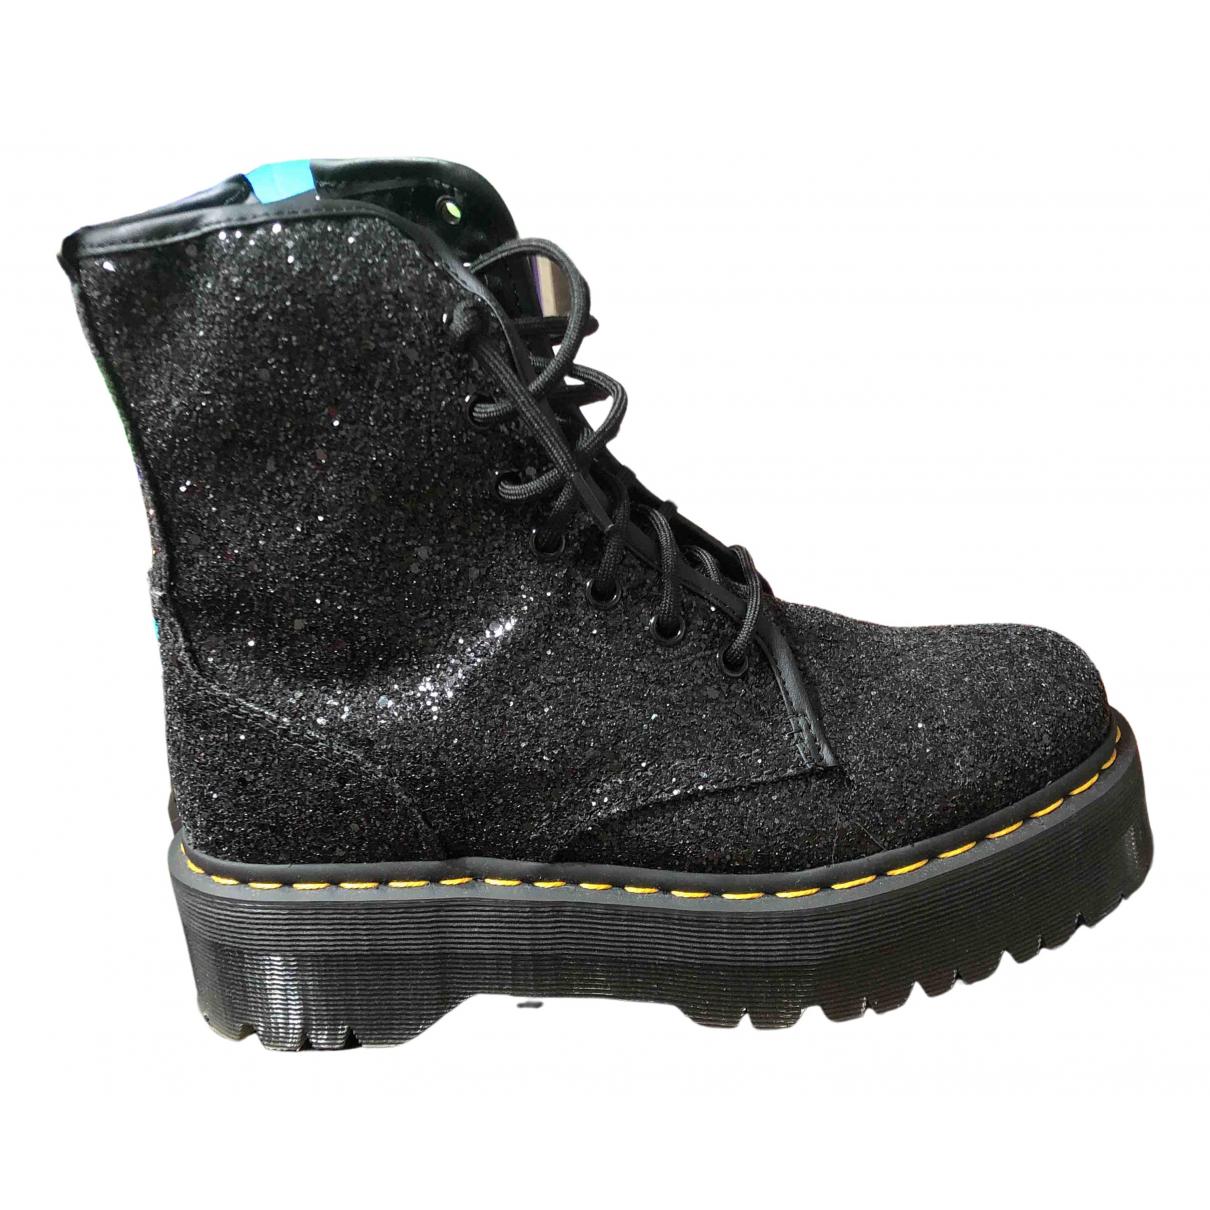 Dr. Martens N Black Glitter Ankle boots for Women 7 UK